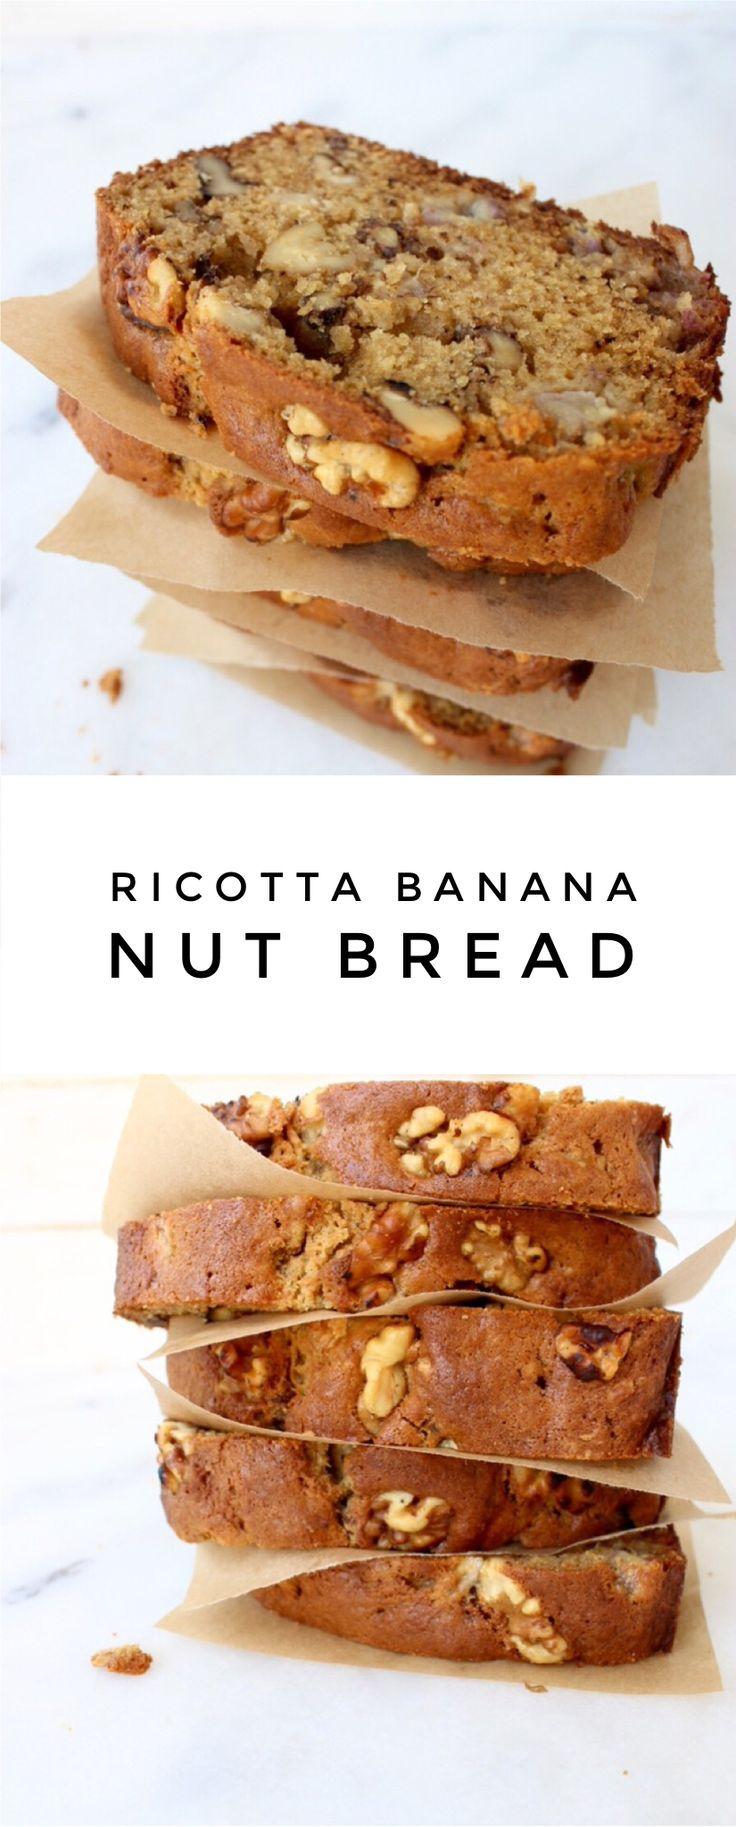 Ricotta Banana Nut Bread Recipe | CiaoFlorentina.com